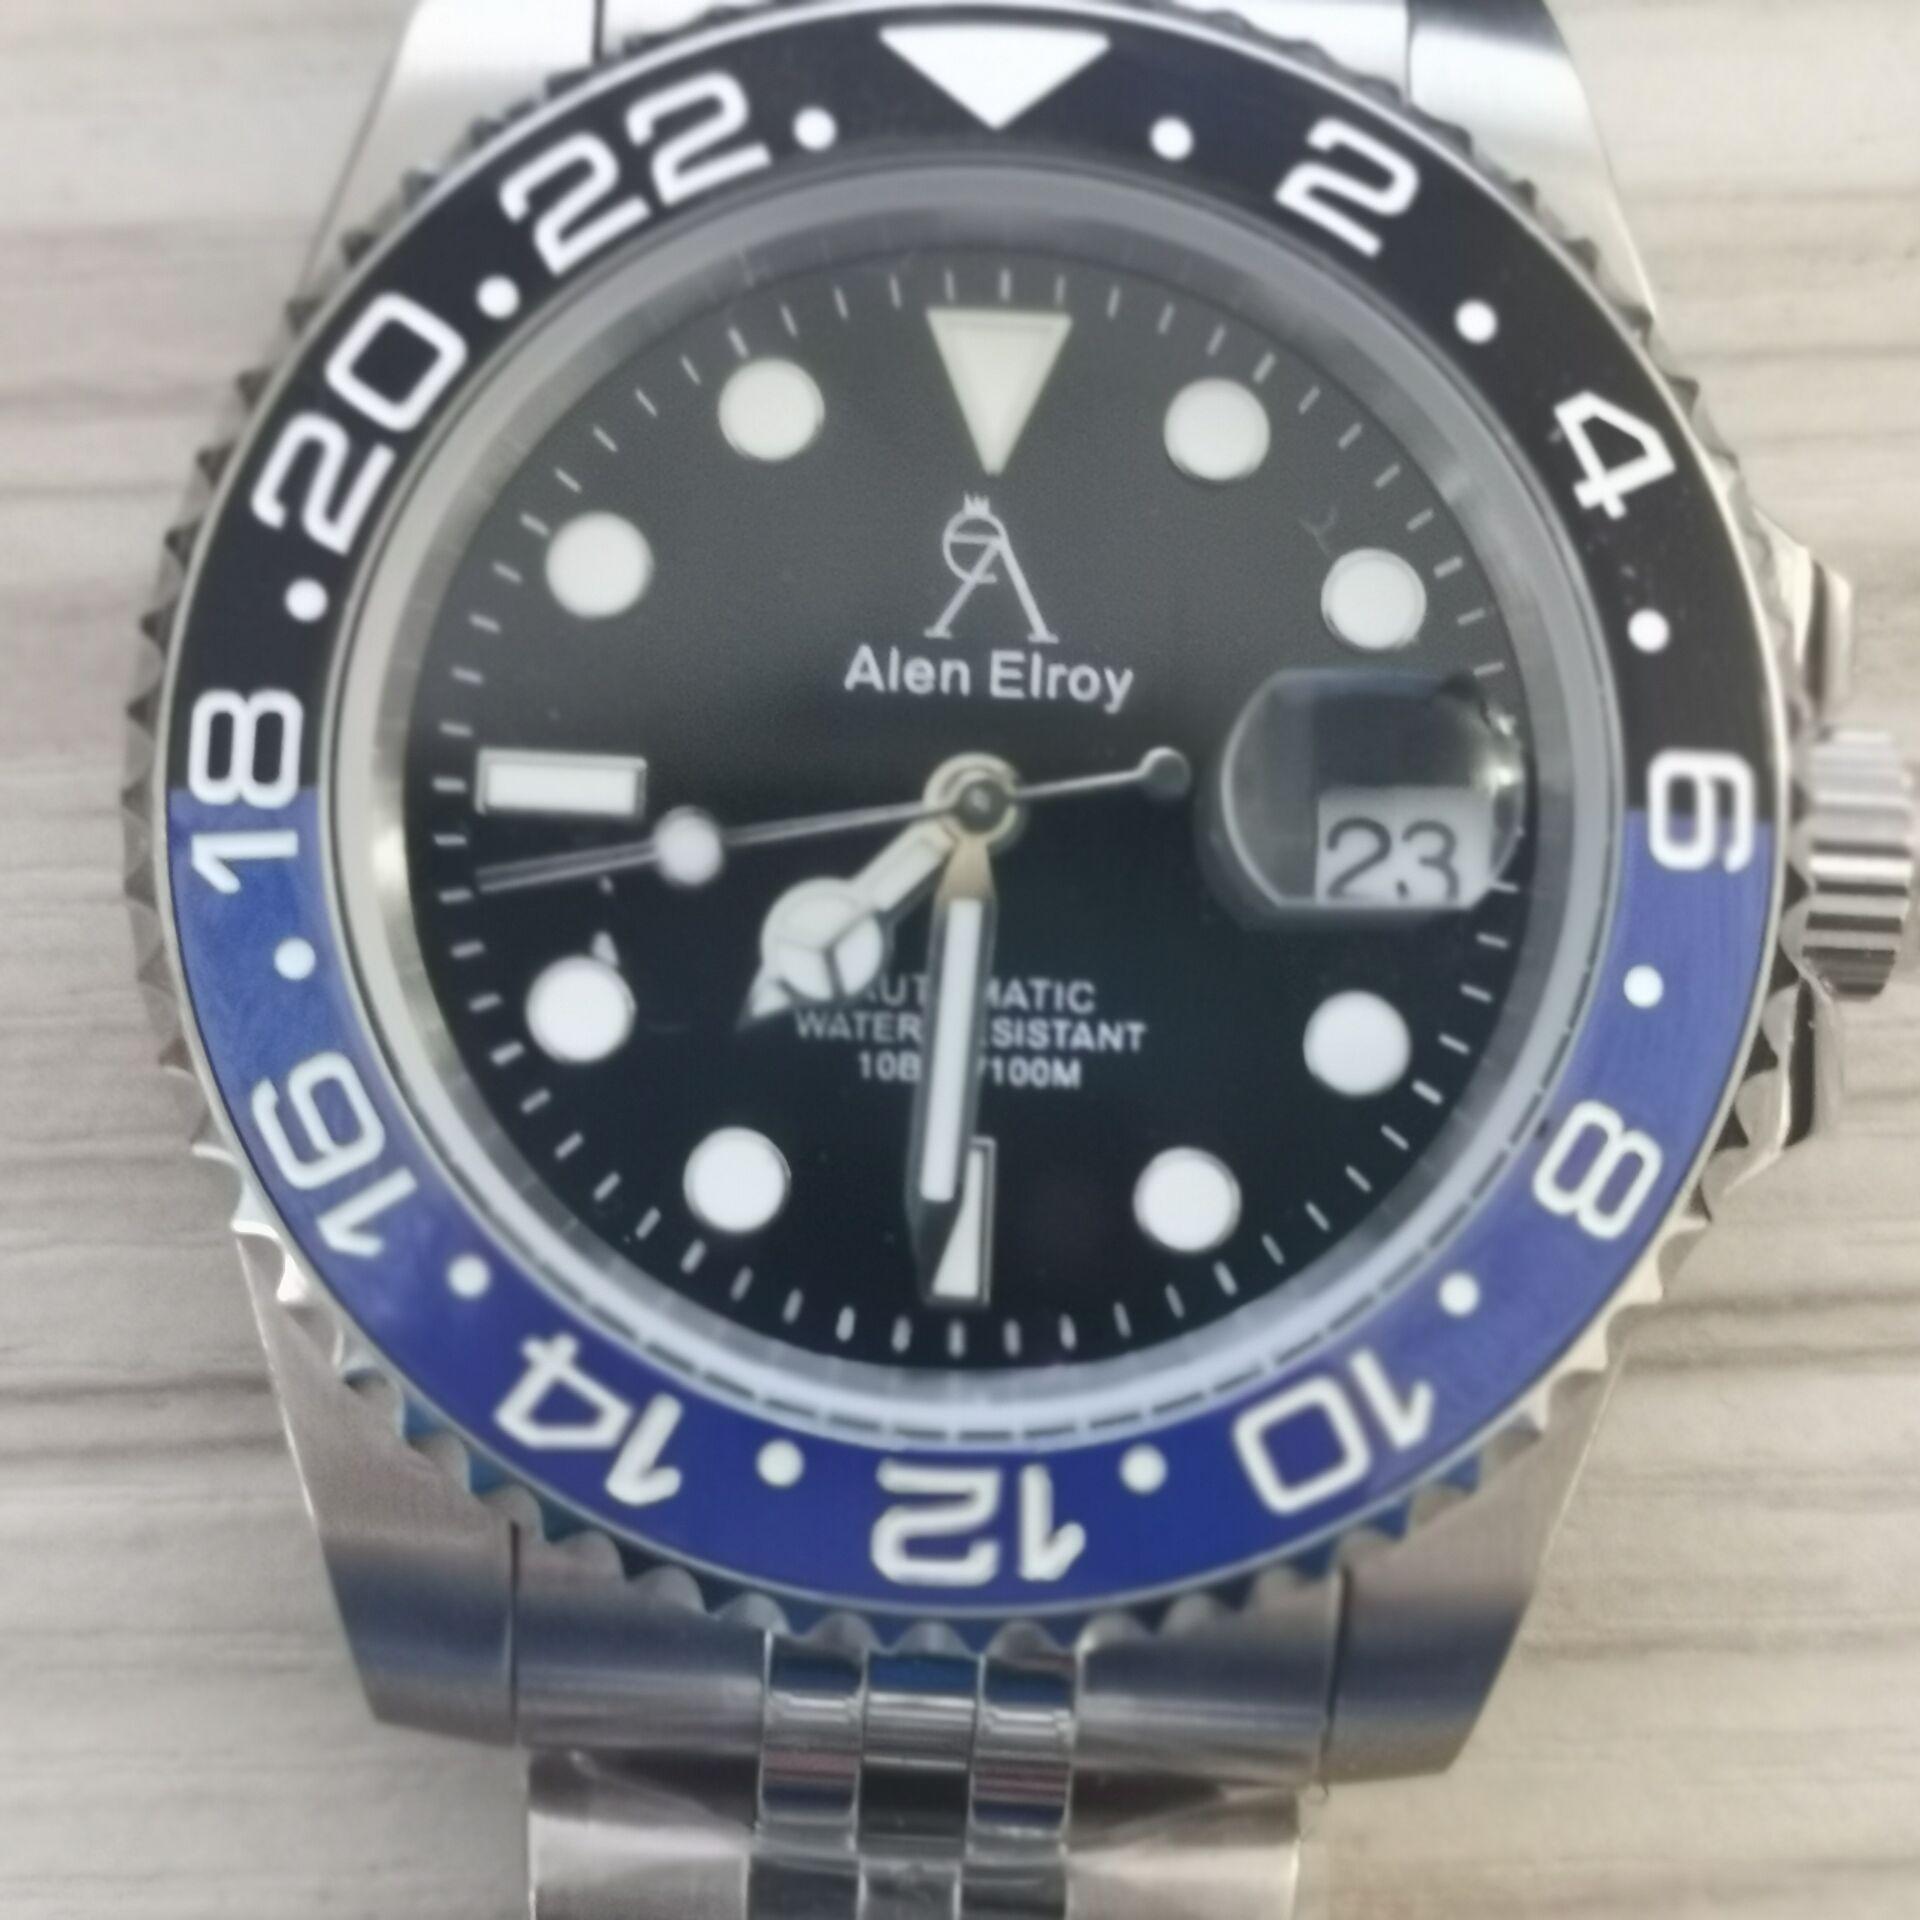 AE High-end watches men's automatic U1 factory ceramic bezel sapphire glass luminous needle sweep movement luxury Black sub 02